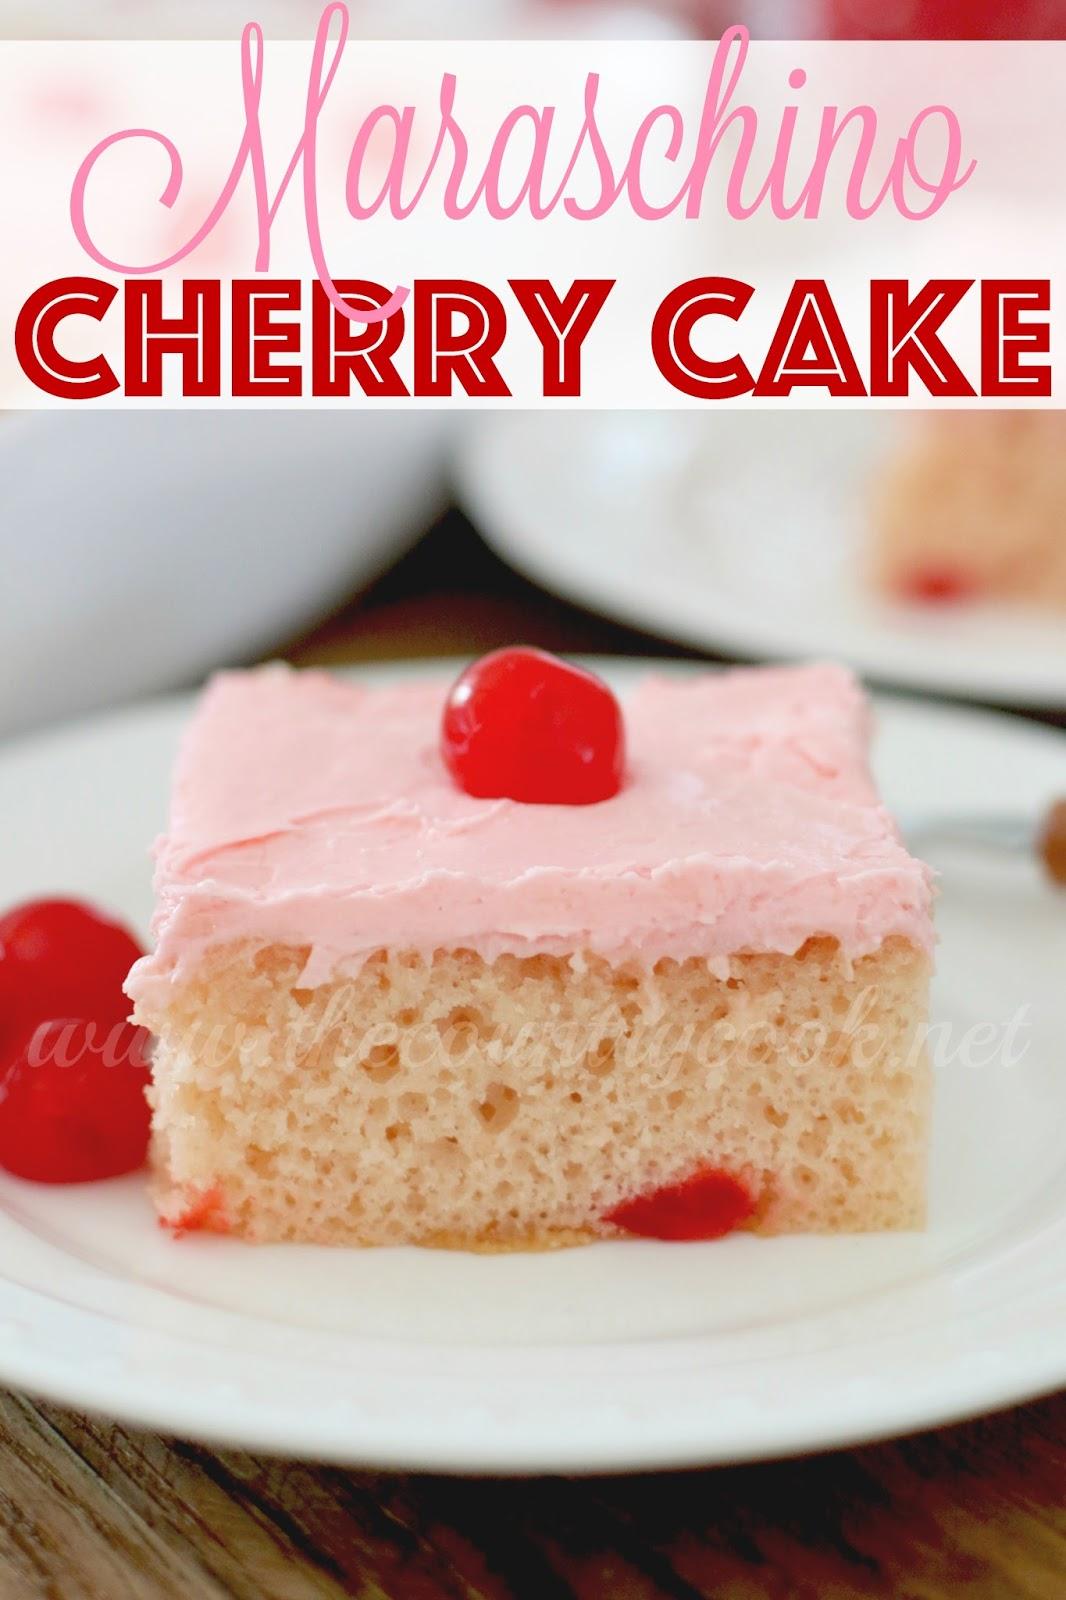 Maraschino cherry cake mix recipes